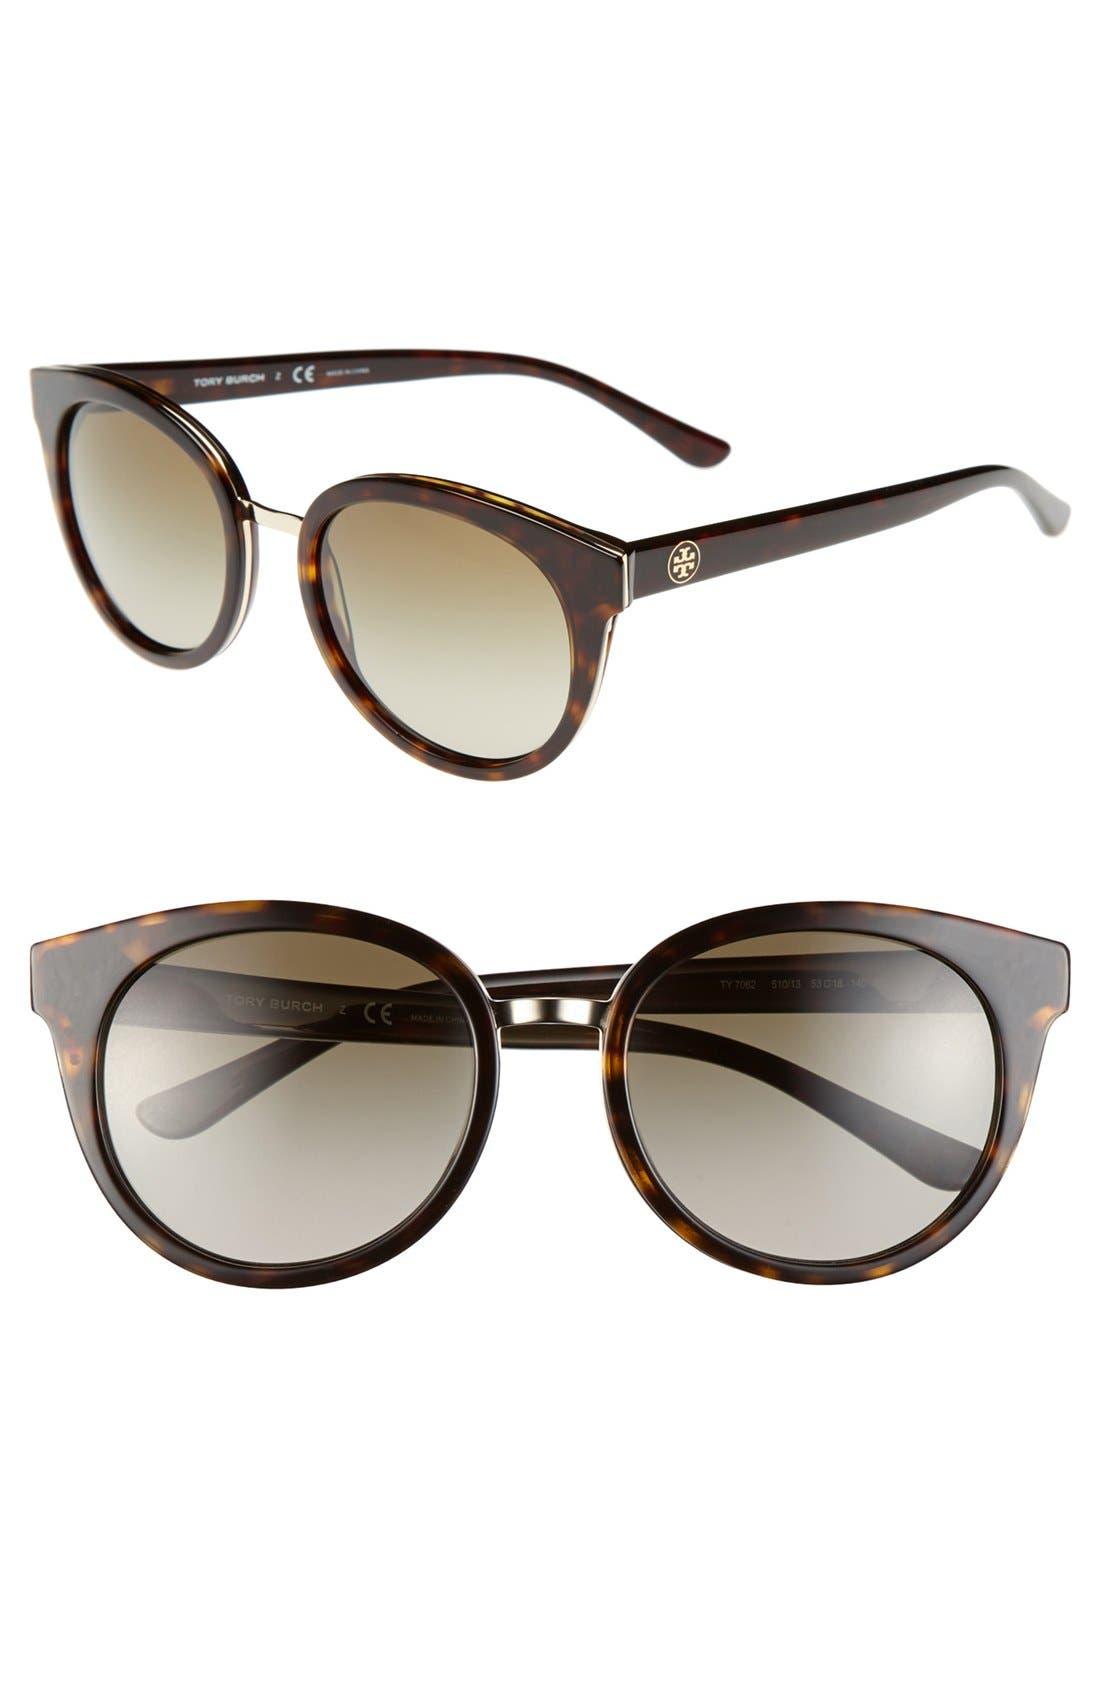 Alternate Image 1 Selected - Tory Burch 'Phantos' 53mm Retro Sunglasses